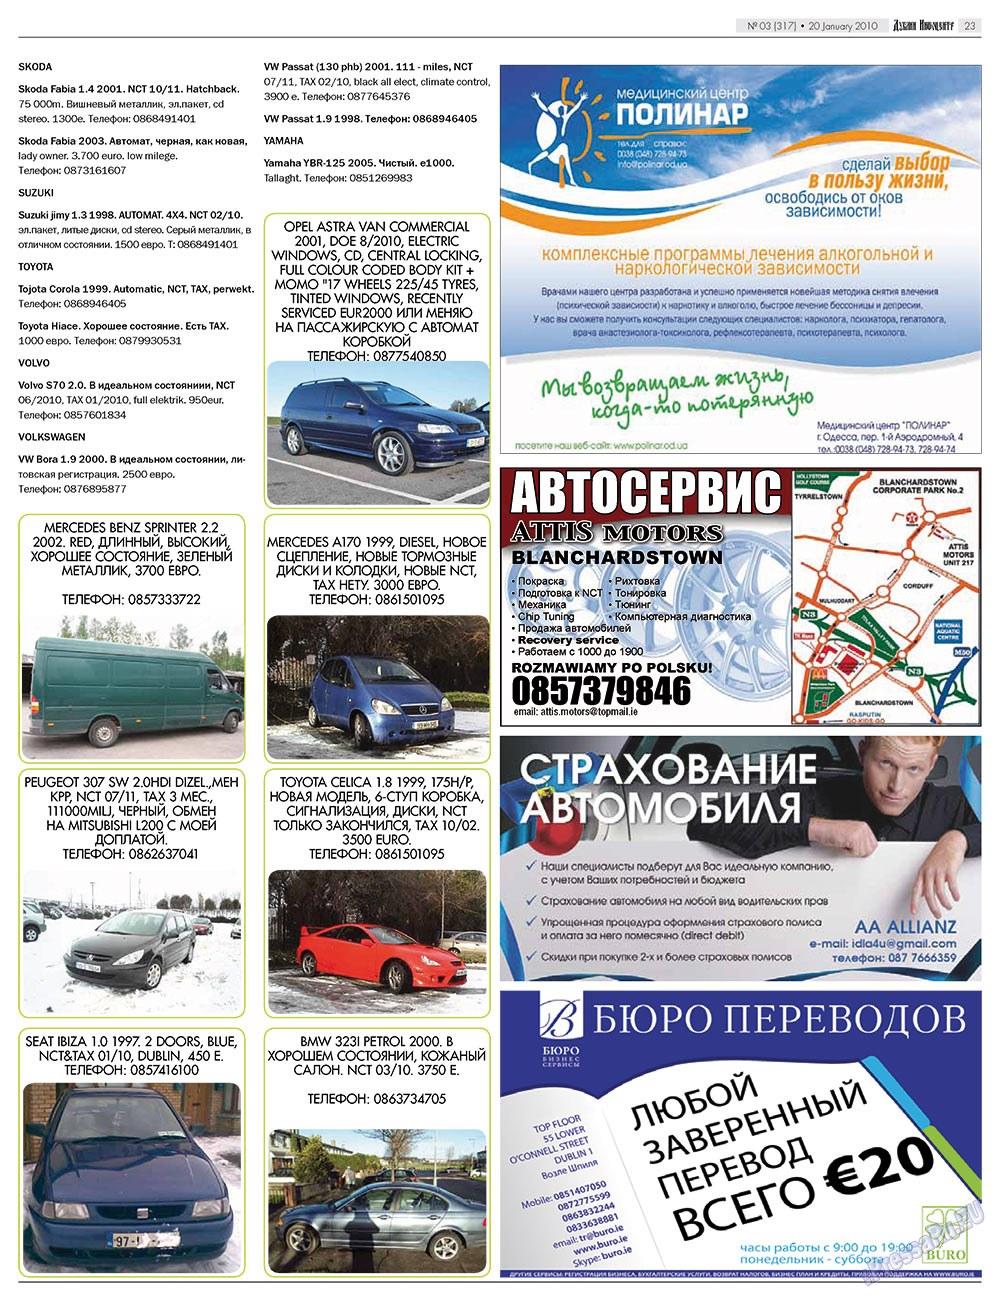 Дублин инфоцентр (газета). 2010 год, номер 3, стр. 23